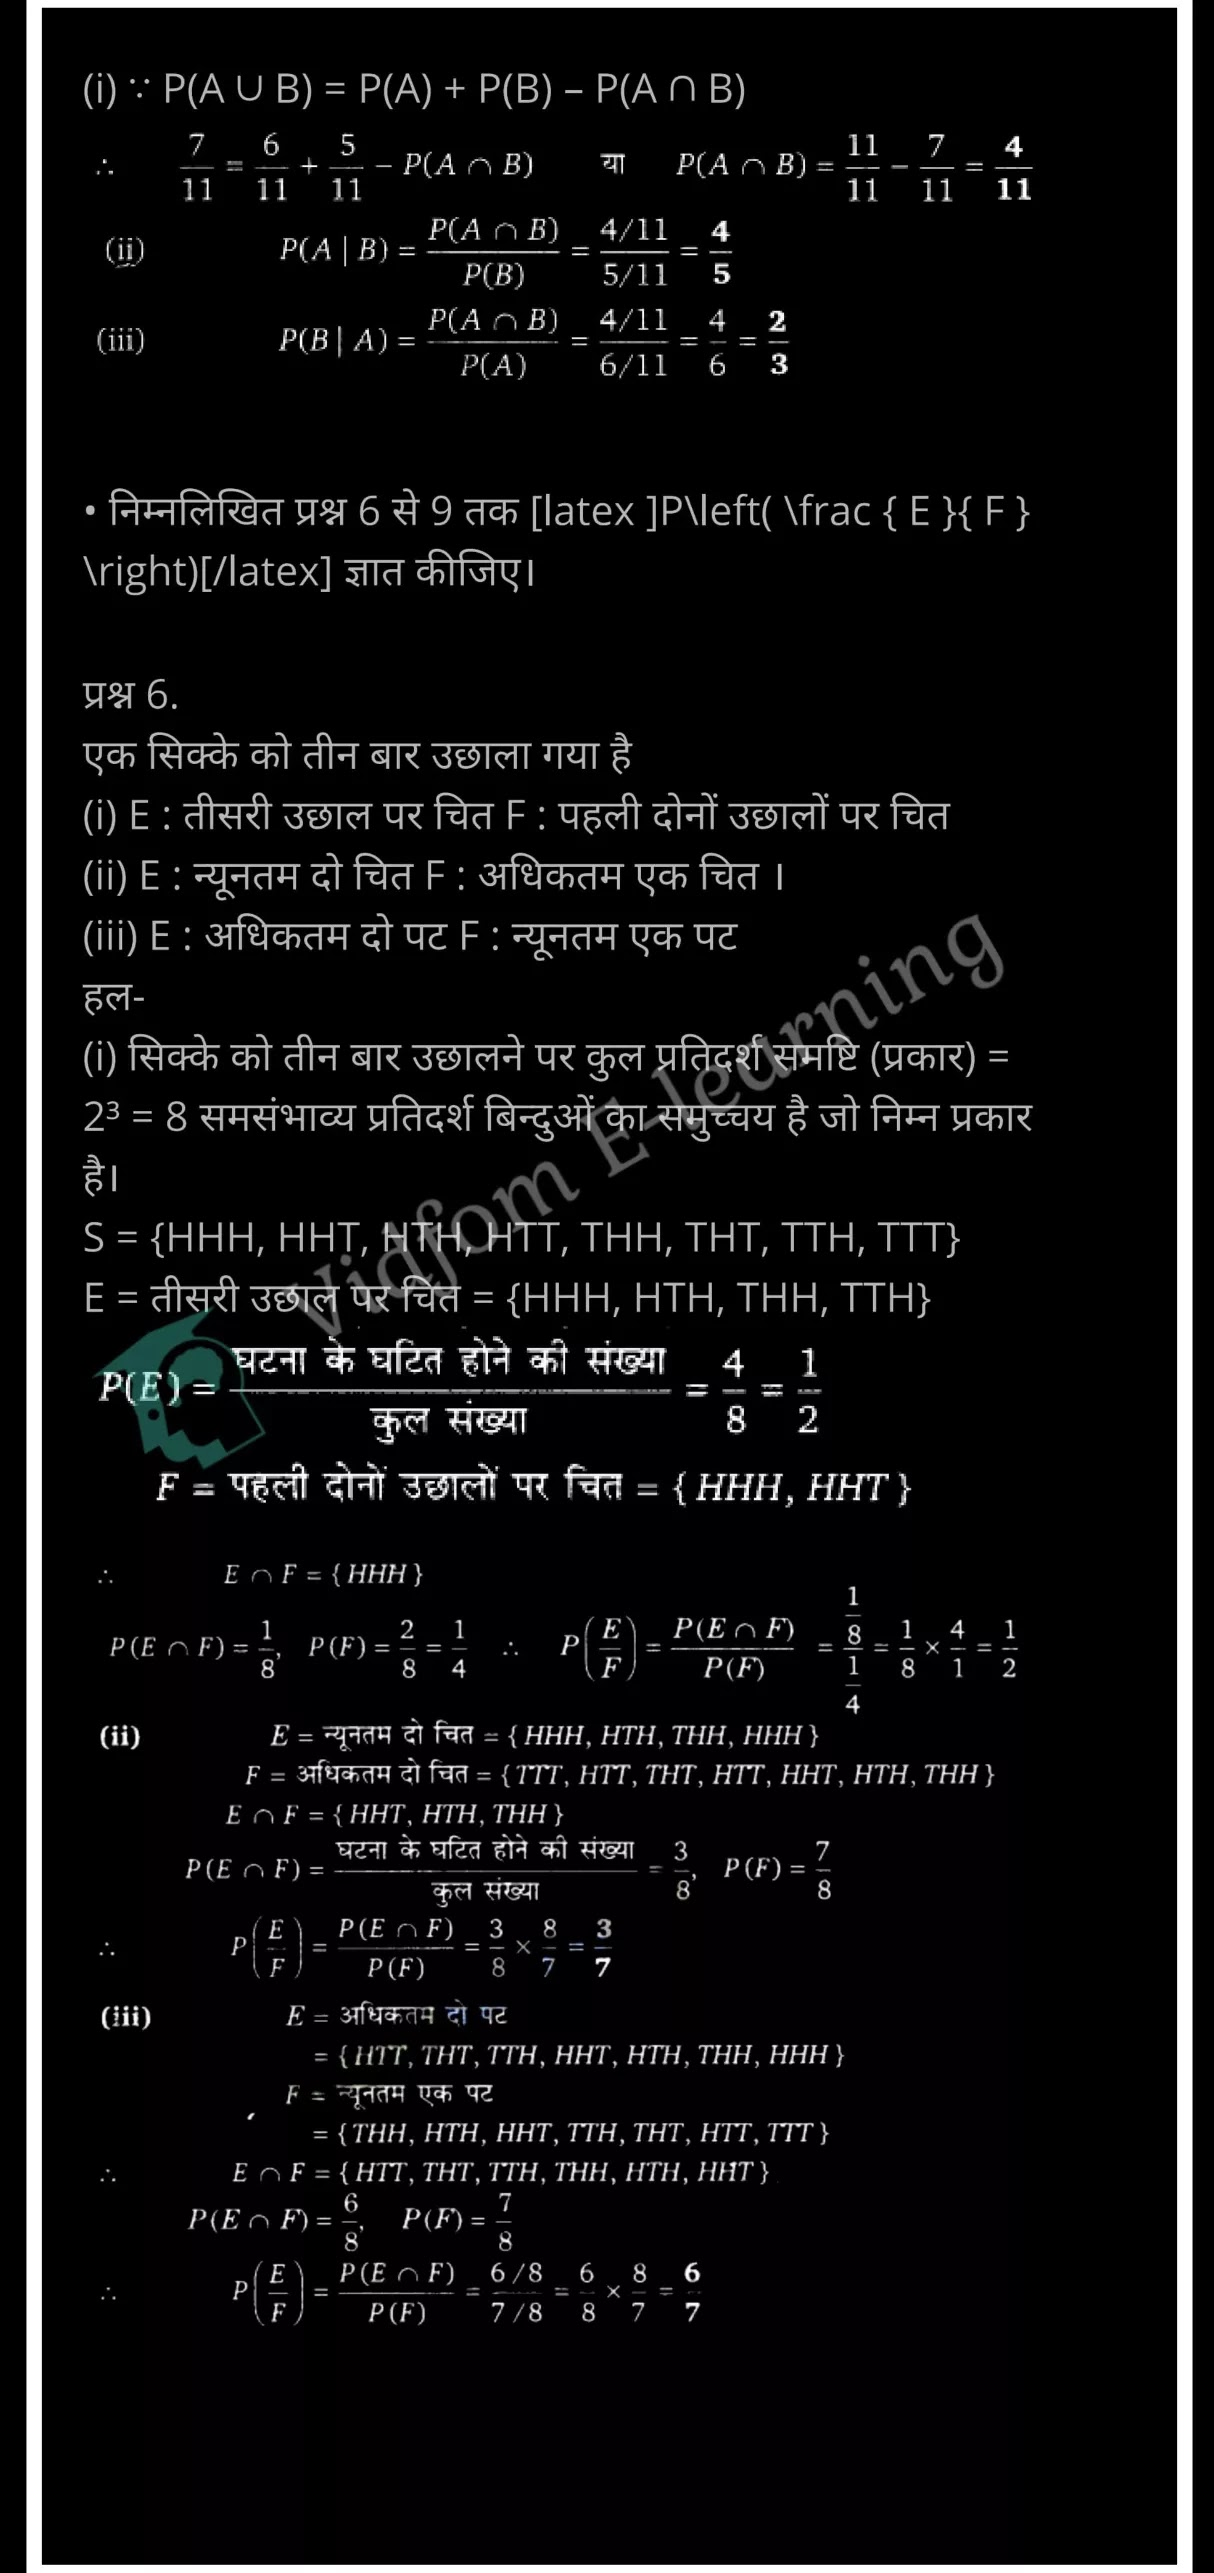 कक्षा 12 गणित  के नोट्स  हिंदी में एनसीईआरटी समाधान,     class 12 Maths Chapter 13,   class 12 Maths Chapter 13 ncert solutions in Hindi,   class 12 Maths Chapter 13 notes in hindi,   class 12 Maths Chapter 13 question answer,   class 12 Maths Chapter 13 notes,   class 12 Maths Chapter 13 class 12 Maths Chapter 13 in  hindi,    class 12 Maths Chapter 13 important questions in  hindi,   class 12 Maths Chapter 13 notes in hindi,    class 12 Maths Chapter 13 test,   class 12 Maths Chapter 13 pdf,   class 12 Maths Chapter 13 notes pdf,   class 12 Maths Chapter 13 exercise solutions,   class 12 Maths Chapter 13 notes study rankers,   class 12 Maths Chapter 13 notes,    class 12 Maths Chapter 13  class 12  notes pdf,   class 12 Maths Chapter 13 class 12  notes  ncert,   class 12 Maths Chapter 13 class 12 pdf,   class 12 Maths Chapter 13  book,   class 12 Maths Chapter 13 quiz class 12  ,    10  th class 12 Maths Chapter 13  book up board,   up board 10  th class 12 Maths Chapter 13 notes,  class 12 Maths,   class 12 Maths ncert solutions in Hindi,   class 12 Maths notes in hindi,   class 12 Maths question answer,   class 12 Maths notes,  class 12 Maths class 12 Maths Chapter 13 in  hindi,    class 12 Maths important questions in  hindi,   class 12 Maths notes in hindi,    class 12 Maths test,  class 12 Maths class 12 Maths Chapter 13 pdf,   class 12 Maths notes pdf,   class 12 Maths exercise solutions,   class 12 Maths,  class 12 Maths notes study rankers,   class 12 Maths notes,  class 12 Maths notes,   class 12 Maths  class 12  notes pdf,   class 12 Maths class 12  notes  ncert,   class 12 Maths class 12 pdf,   class 12 Maths  book,  class 12 Maths quiz class 12  ,  10  th class 12 Maths    book up board,    up board 10  th class 12 Maths notes,      कक्षा 12 गणित अध्याय 13 ,  कक्षा 12 गणित, कक्षा 12 गणित अध्याय 13  के नोट्स हिंदी में,  कक्षा 12 का हिंदी अध्याय 13 का प्रश्न उत्तर,  कक्षा 12 गणित अध्याय 13 के नोट्स,  10 कक्षा गणित  हिंदी में, कक्षा 12 गणित अध्याय 13  हिं